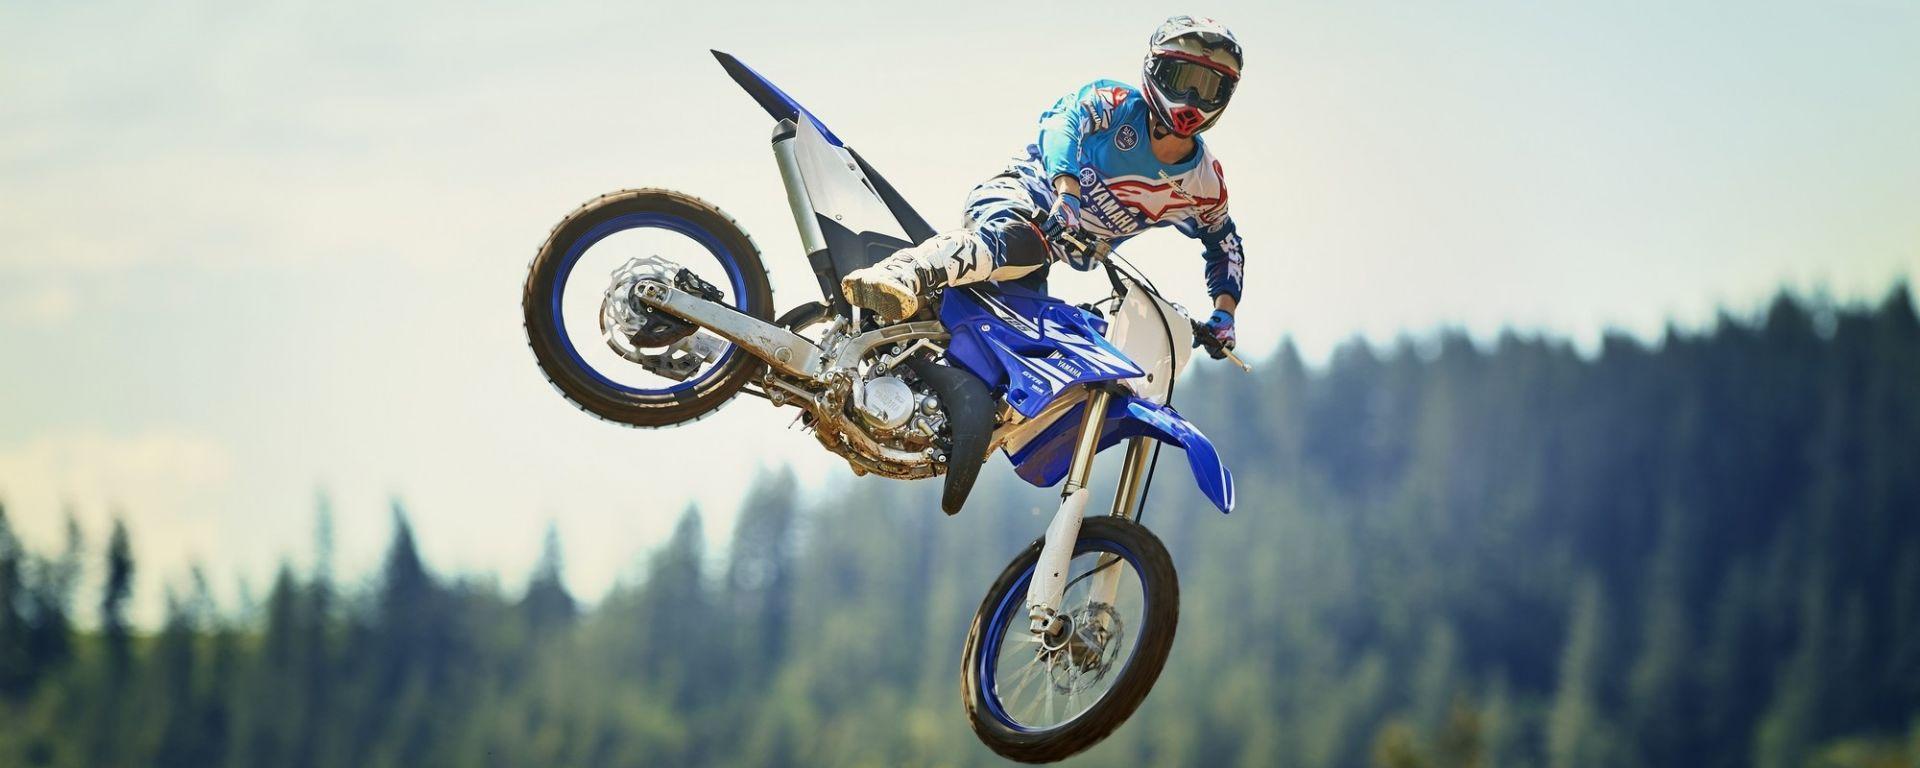 1 ottobre MX Superchampions a Mantova: Yamaha ci sarà